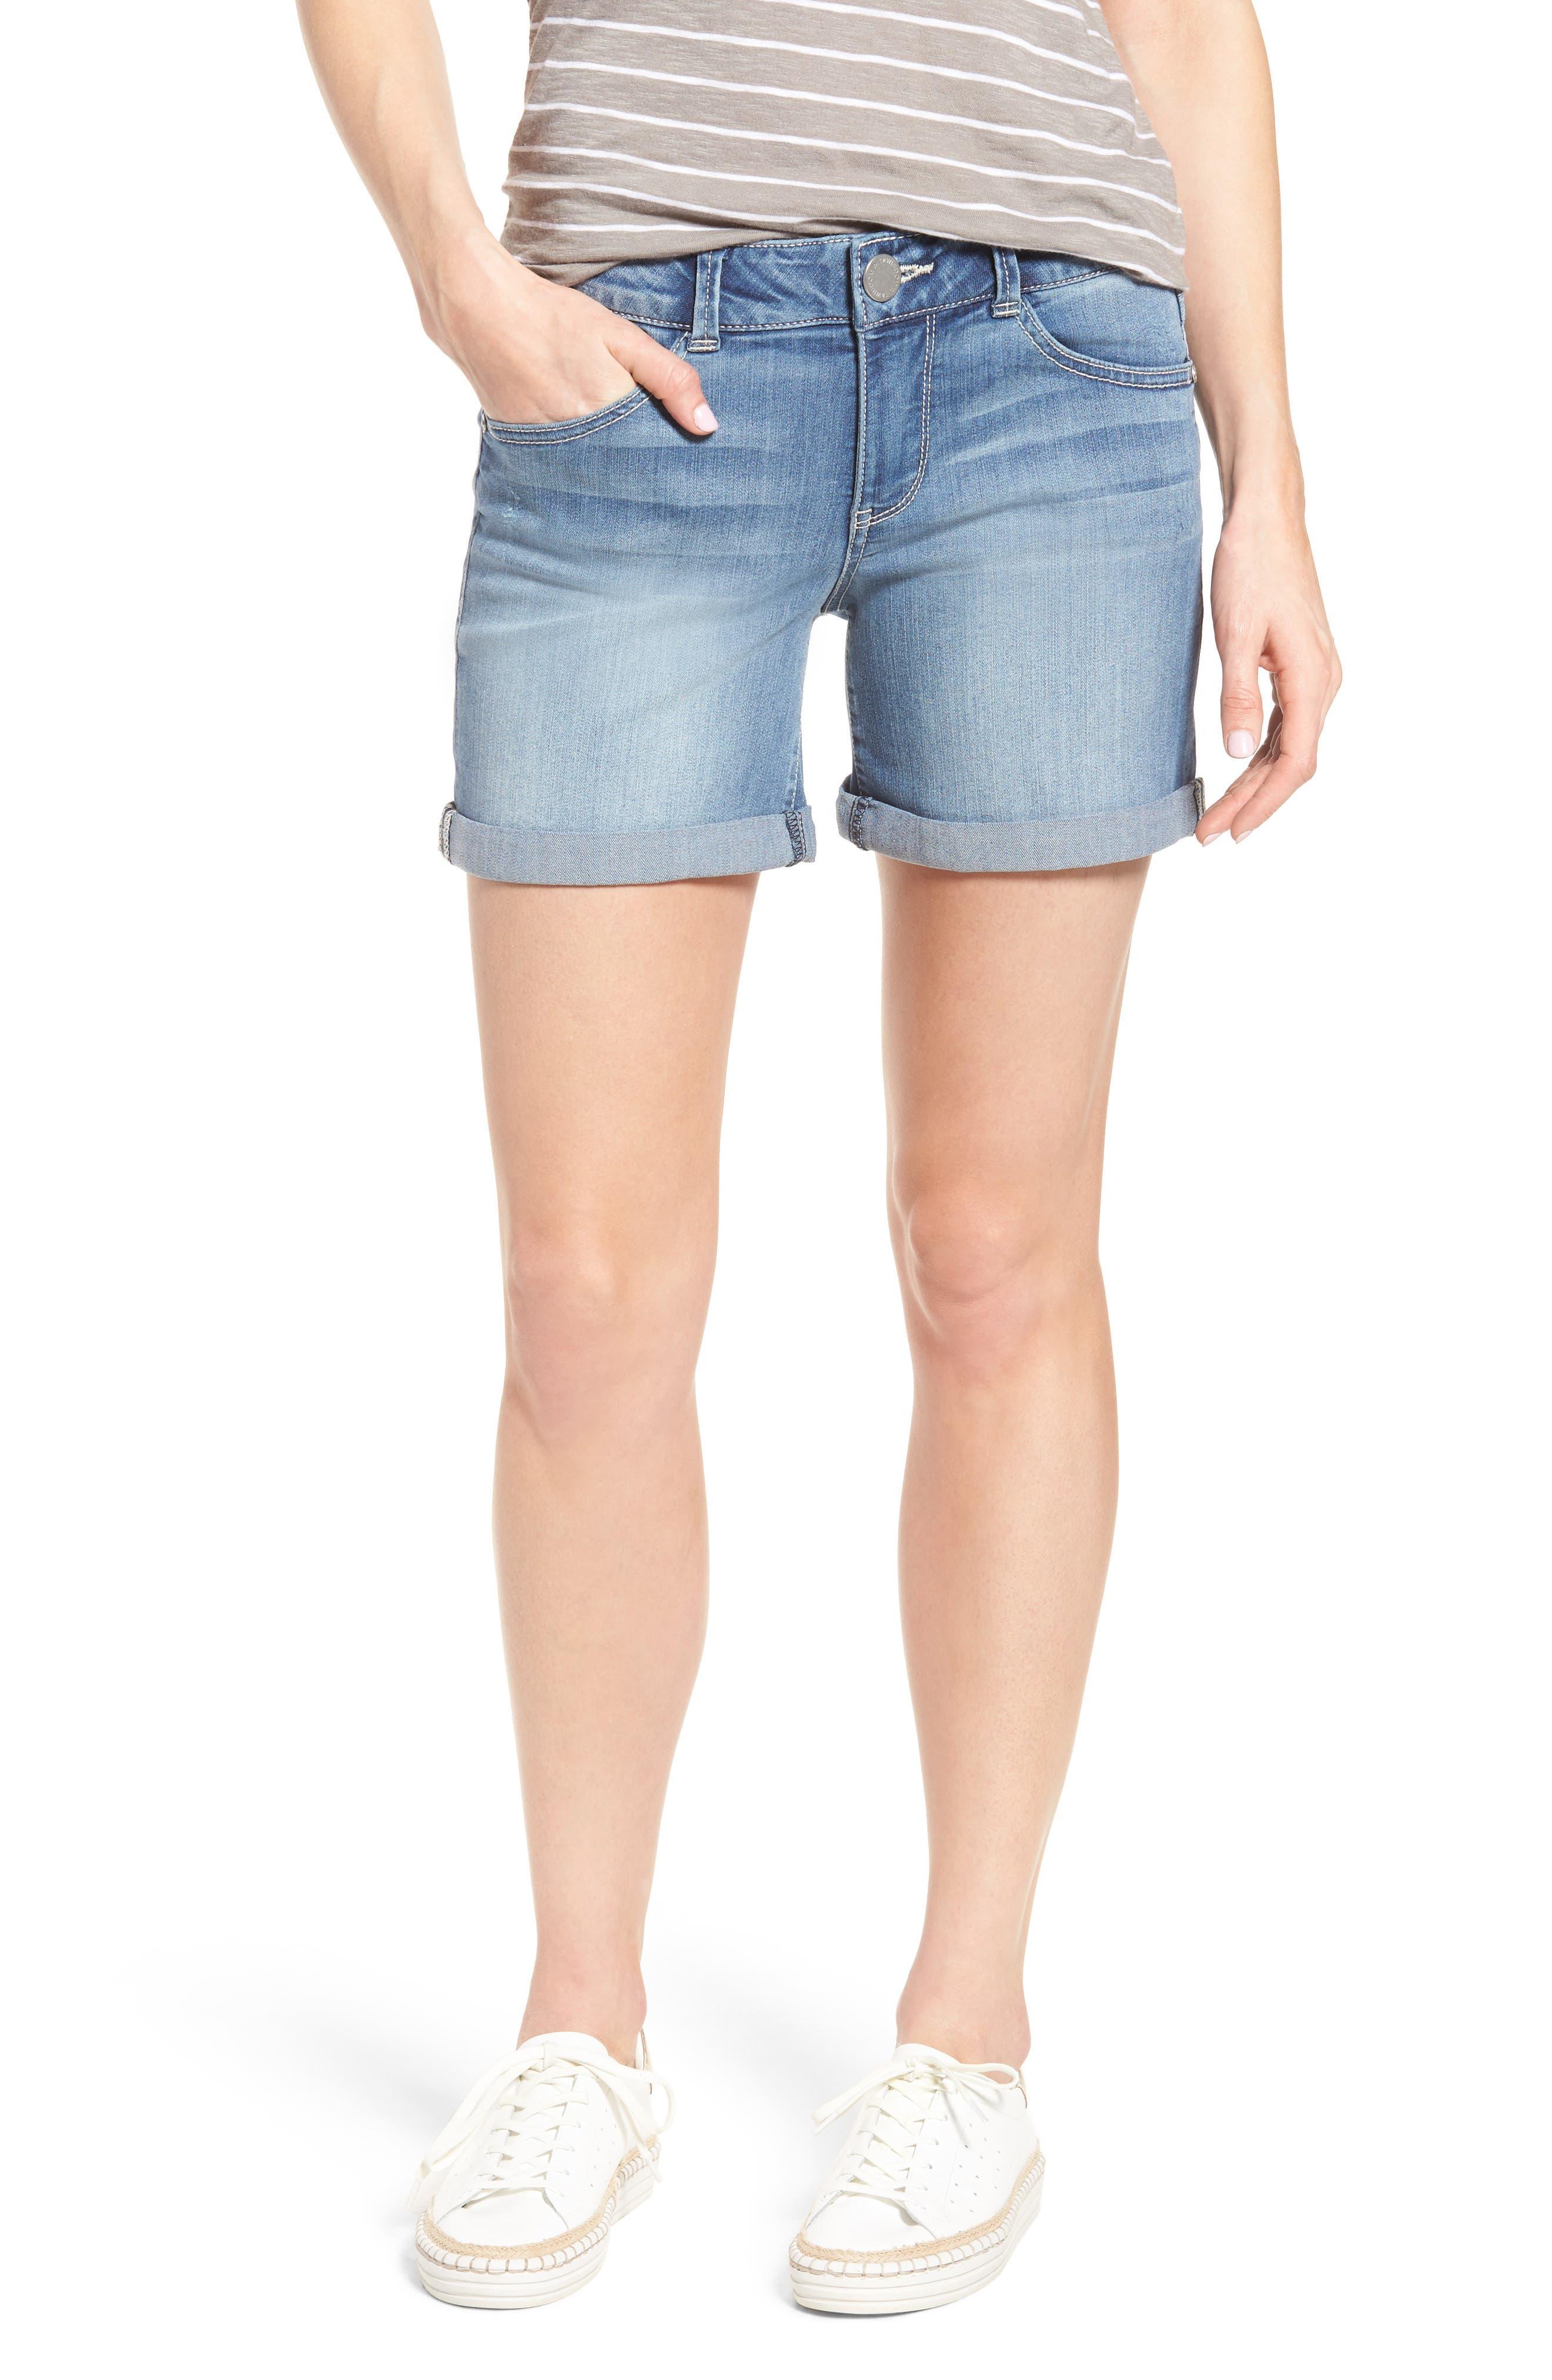 Alternate Image 1 Selected - Wit & Wisdom Ab-solution Cuffed Denim Shorts (Regular & Petite) (Nordstrom Exclusive)